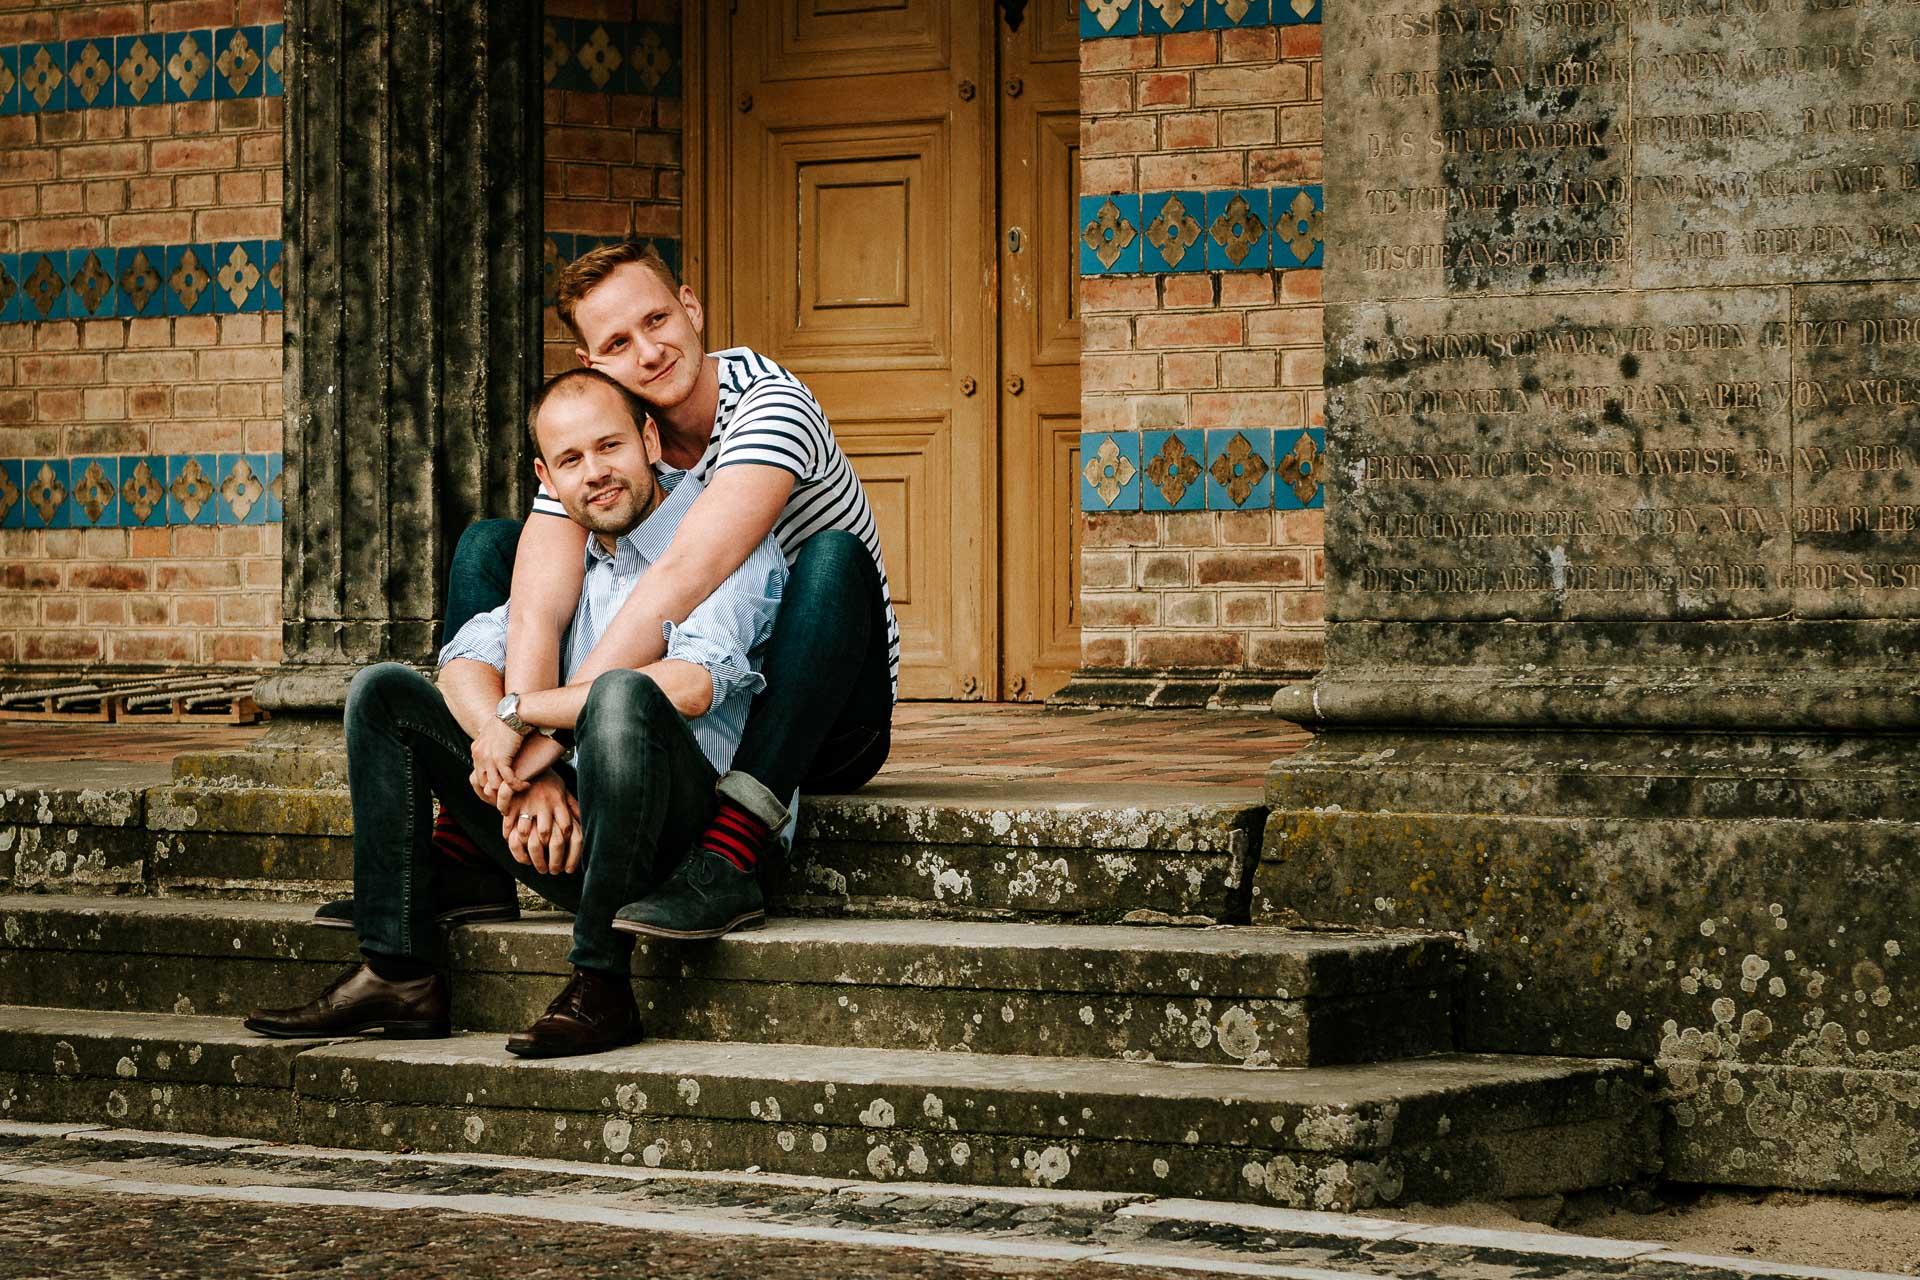 Verlobungsshooting mit schwulem Paar